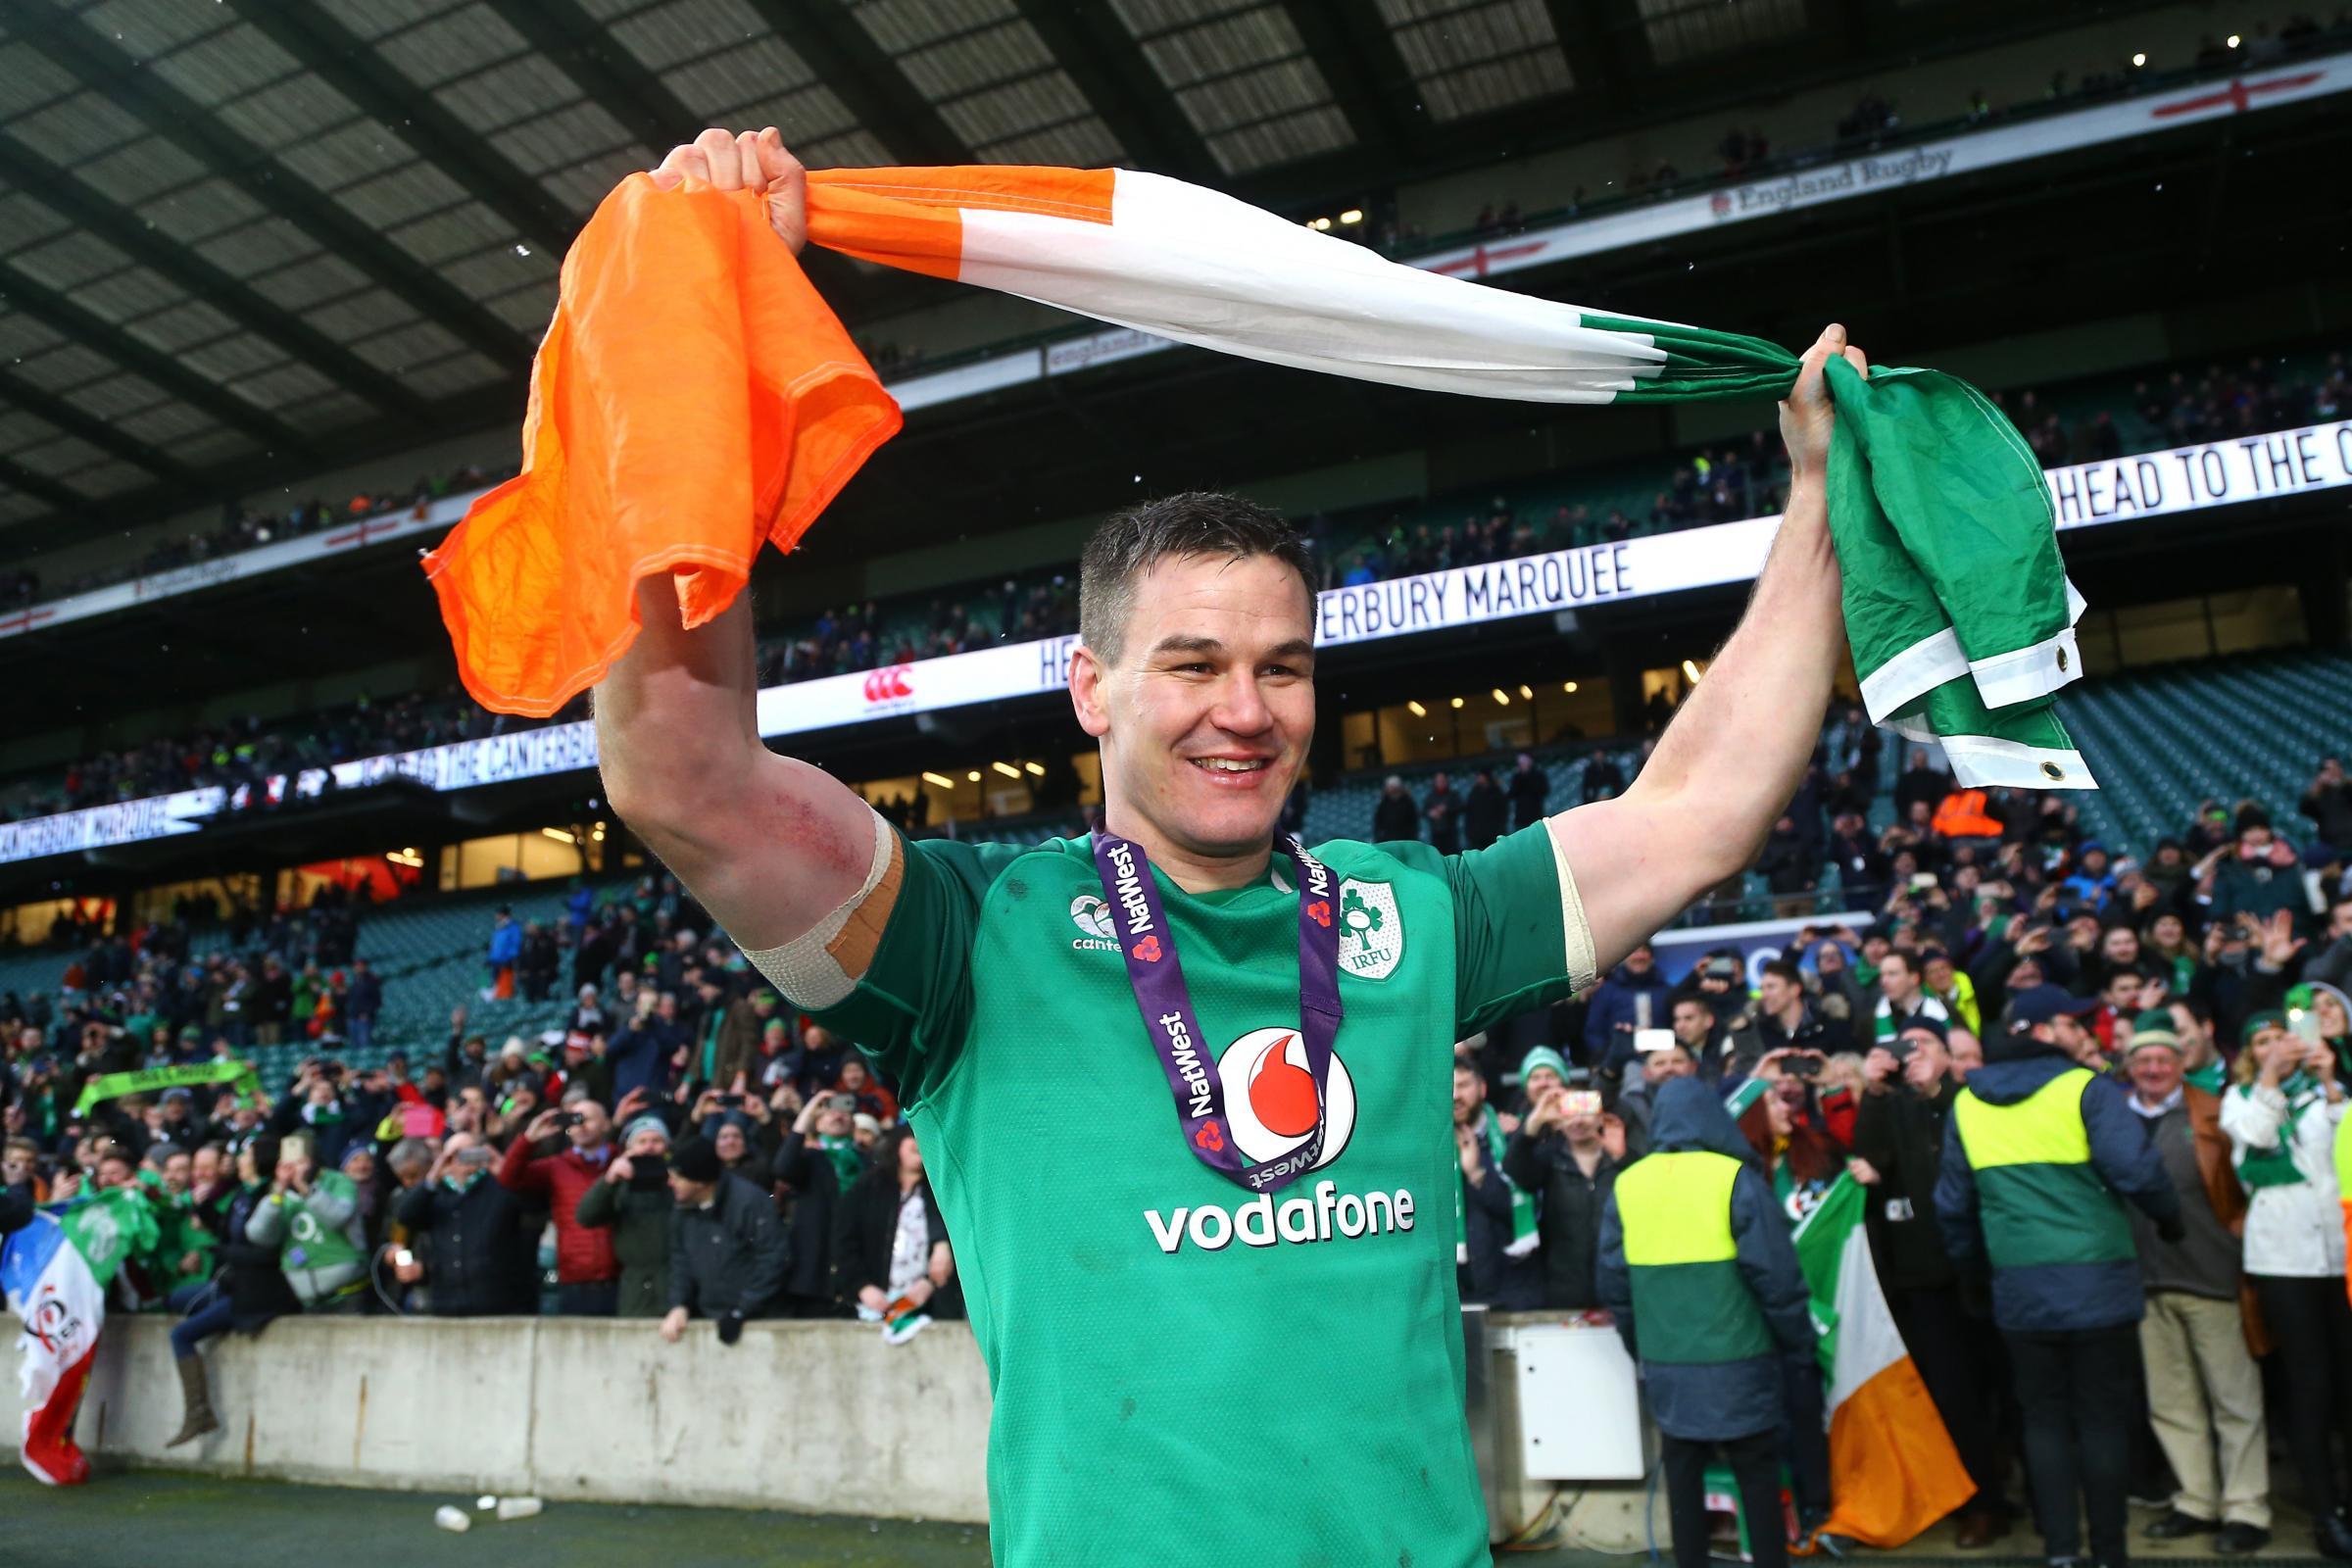 Ireland semi-final Johnny Sexton claims the Rugby Union Writers' Club Award - Bridgwater Mercury